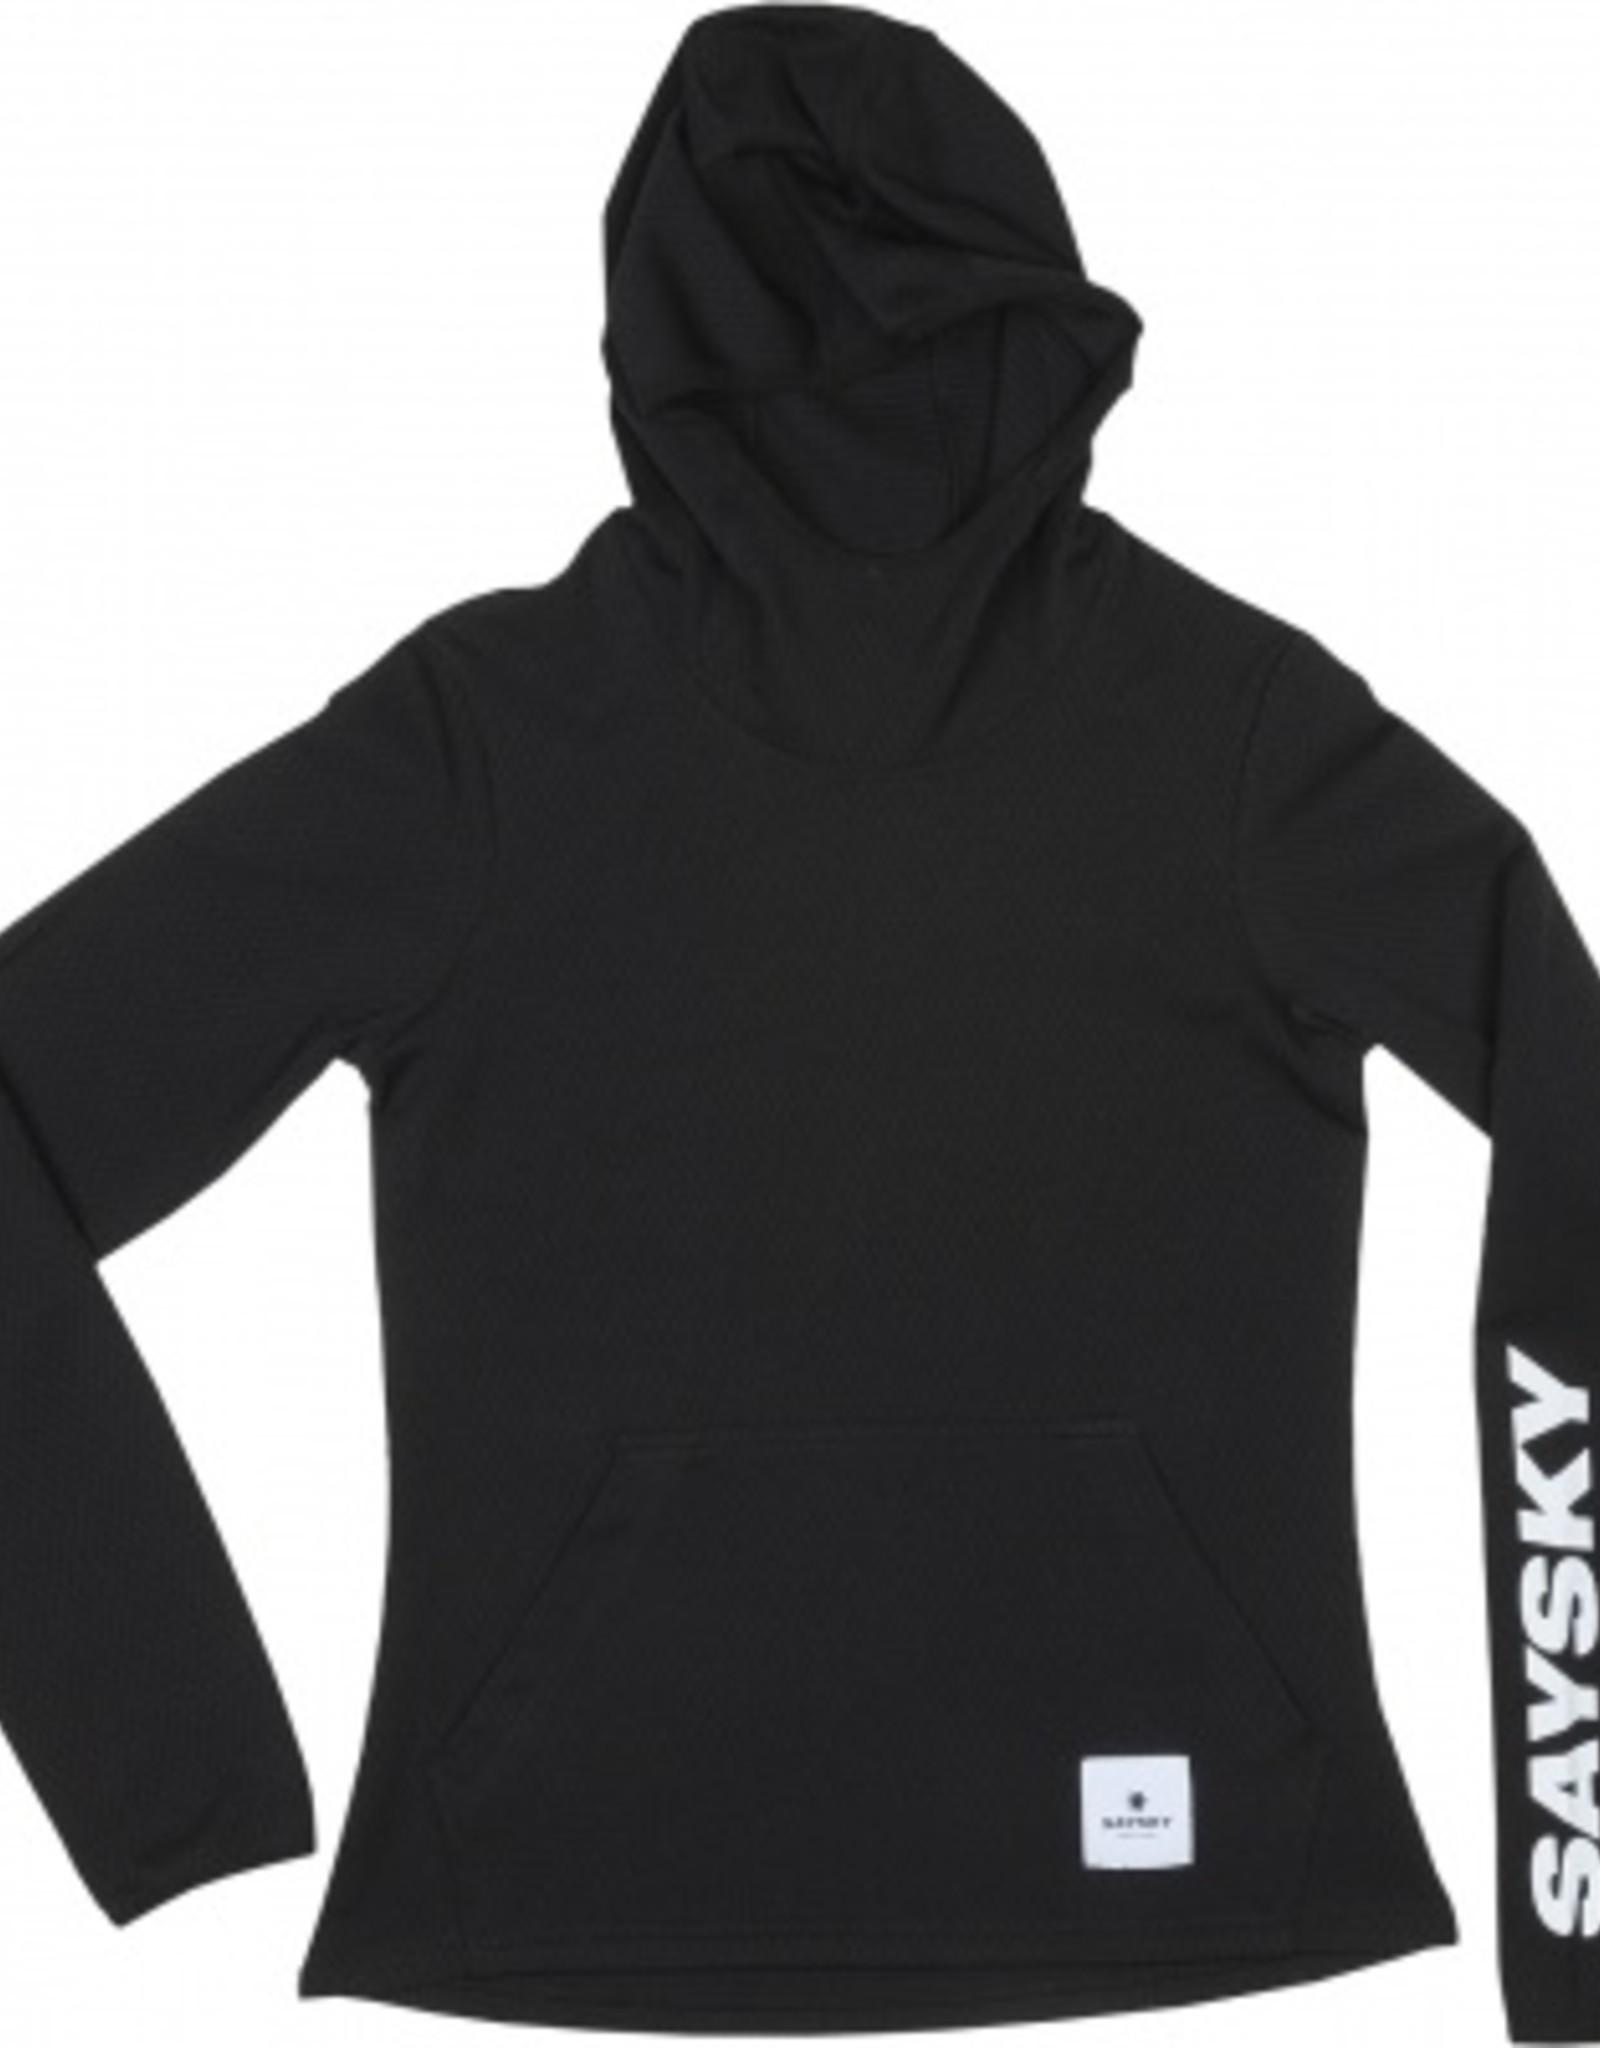 Saysky Hooded Pace Fleece dames (ref EGRFL01)